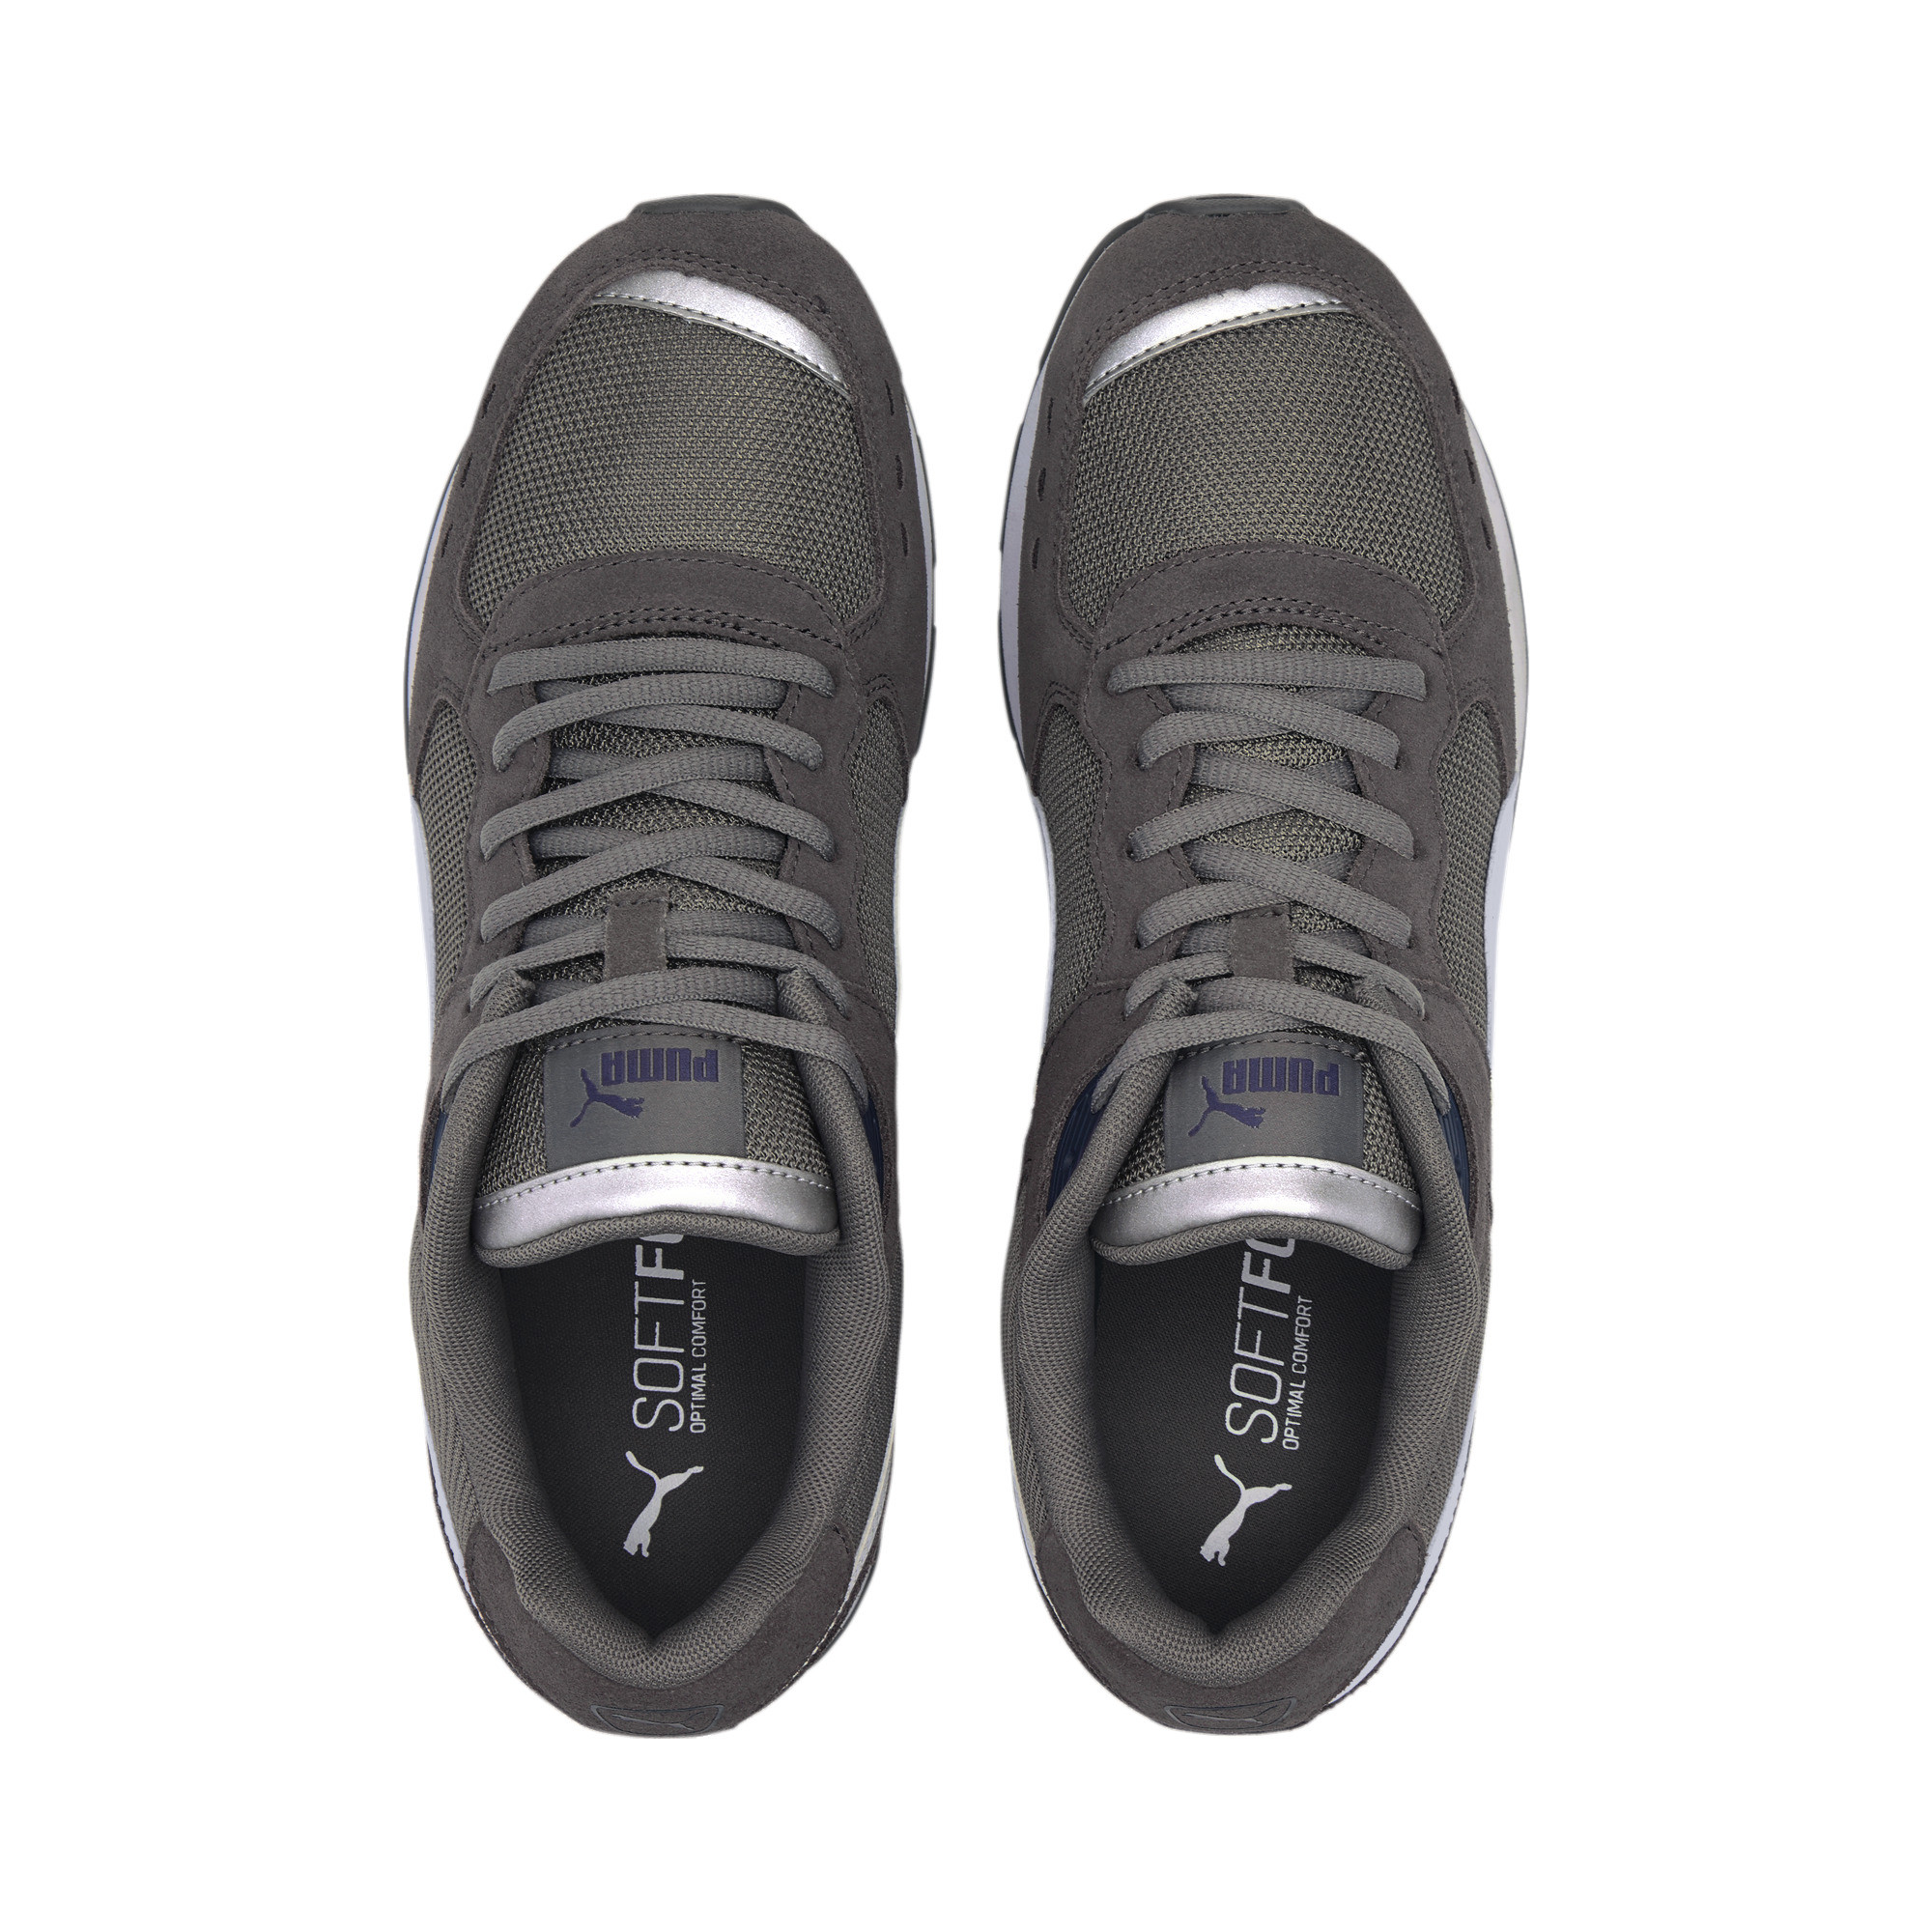 PUMA-Men-039-s-Vista-Sneakers thumbnail 20